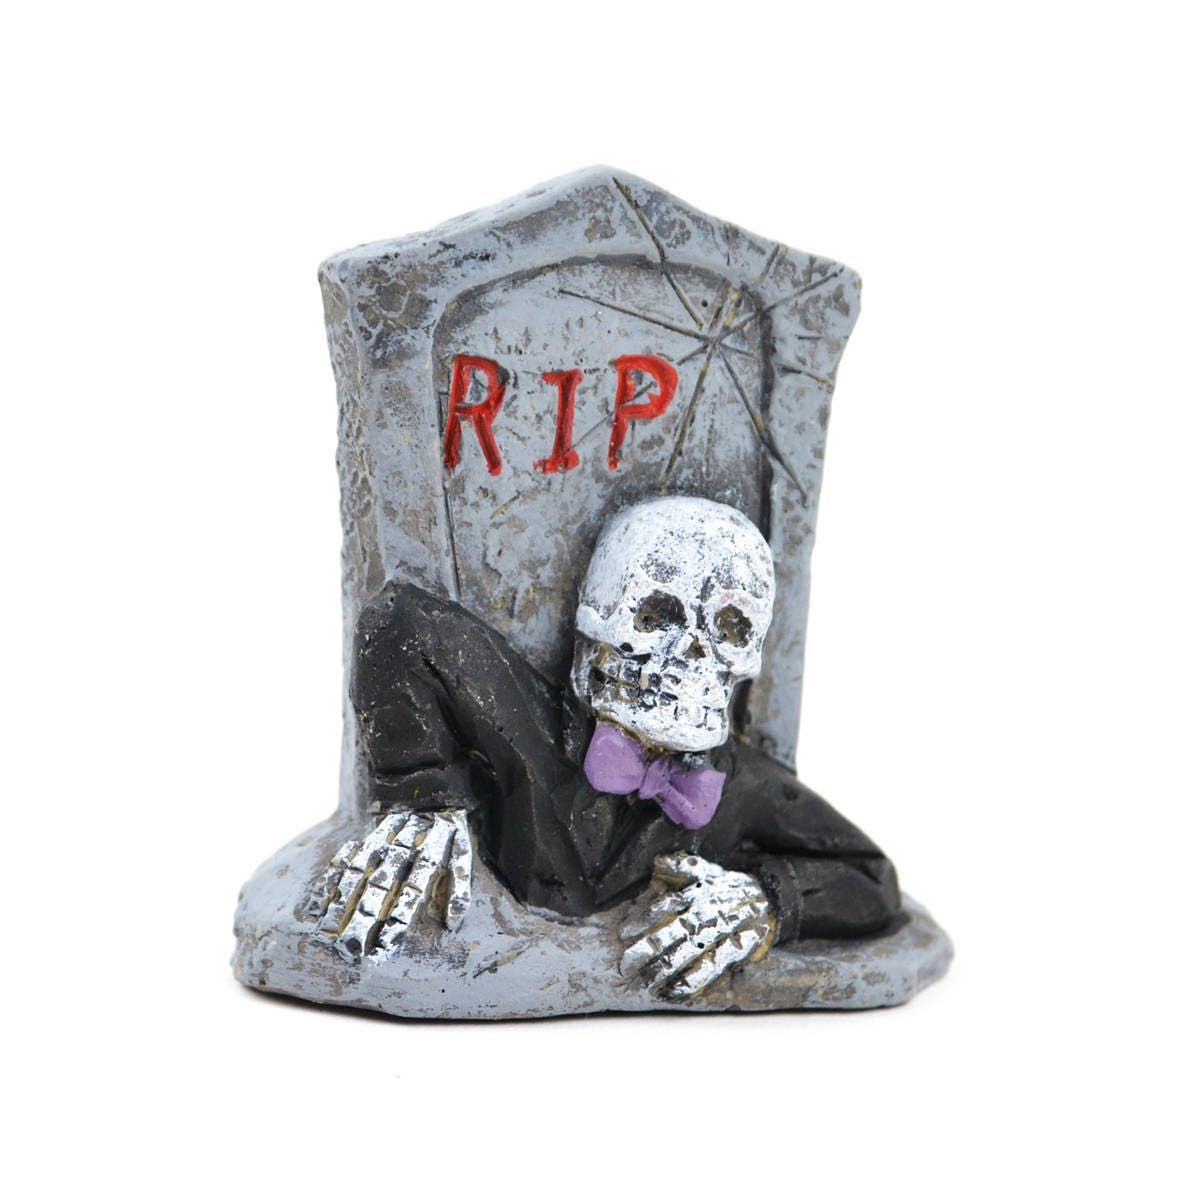 Handmade ressenti tombe//Grave Halloween Hanging Décoration